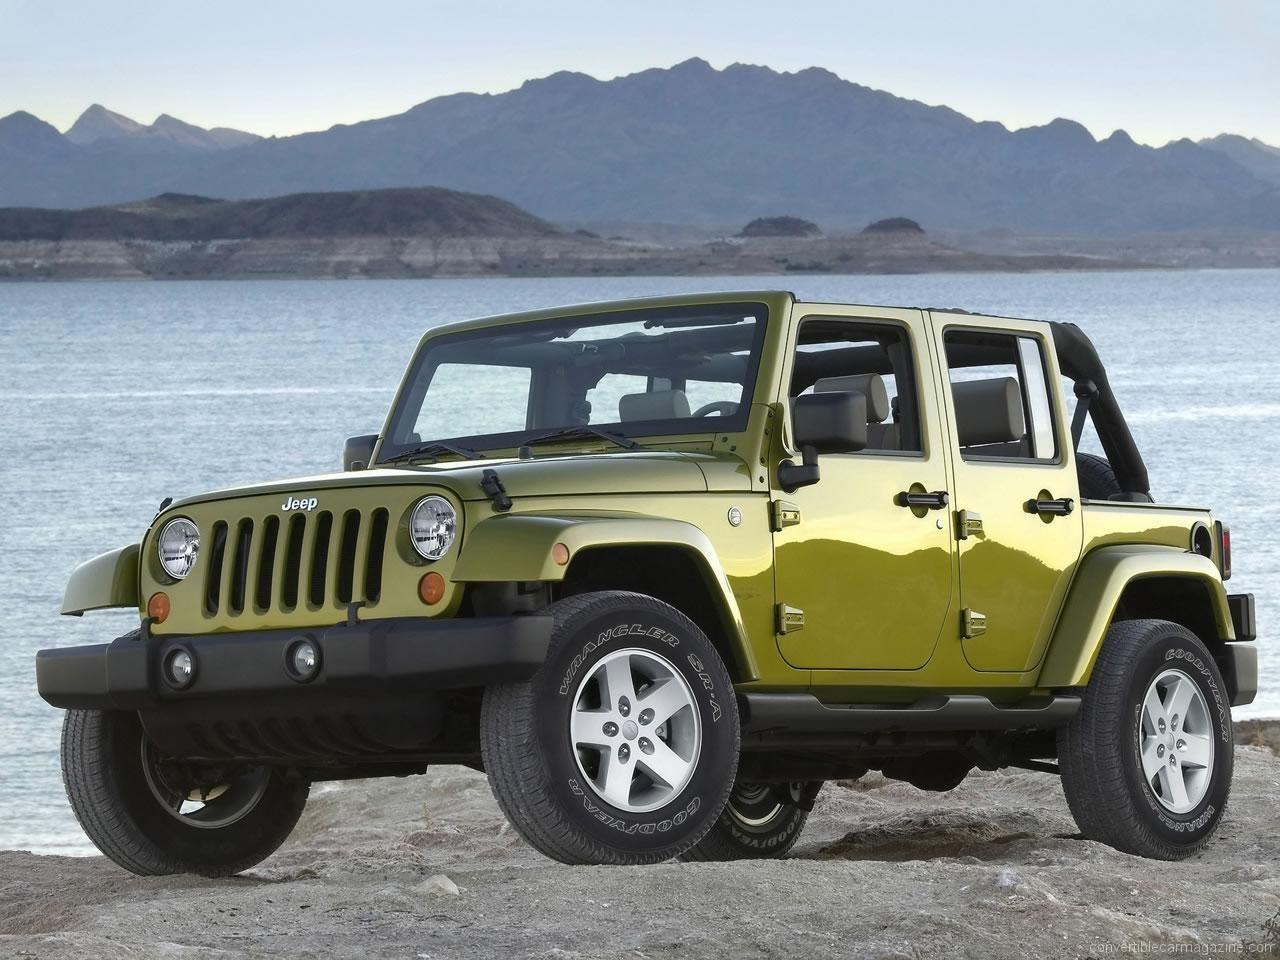 Here At Lebanon Chrysler Dodge Jeep Ram The Jeep Wrangler Comes